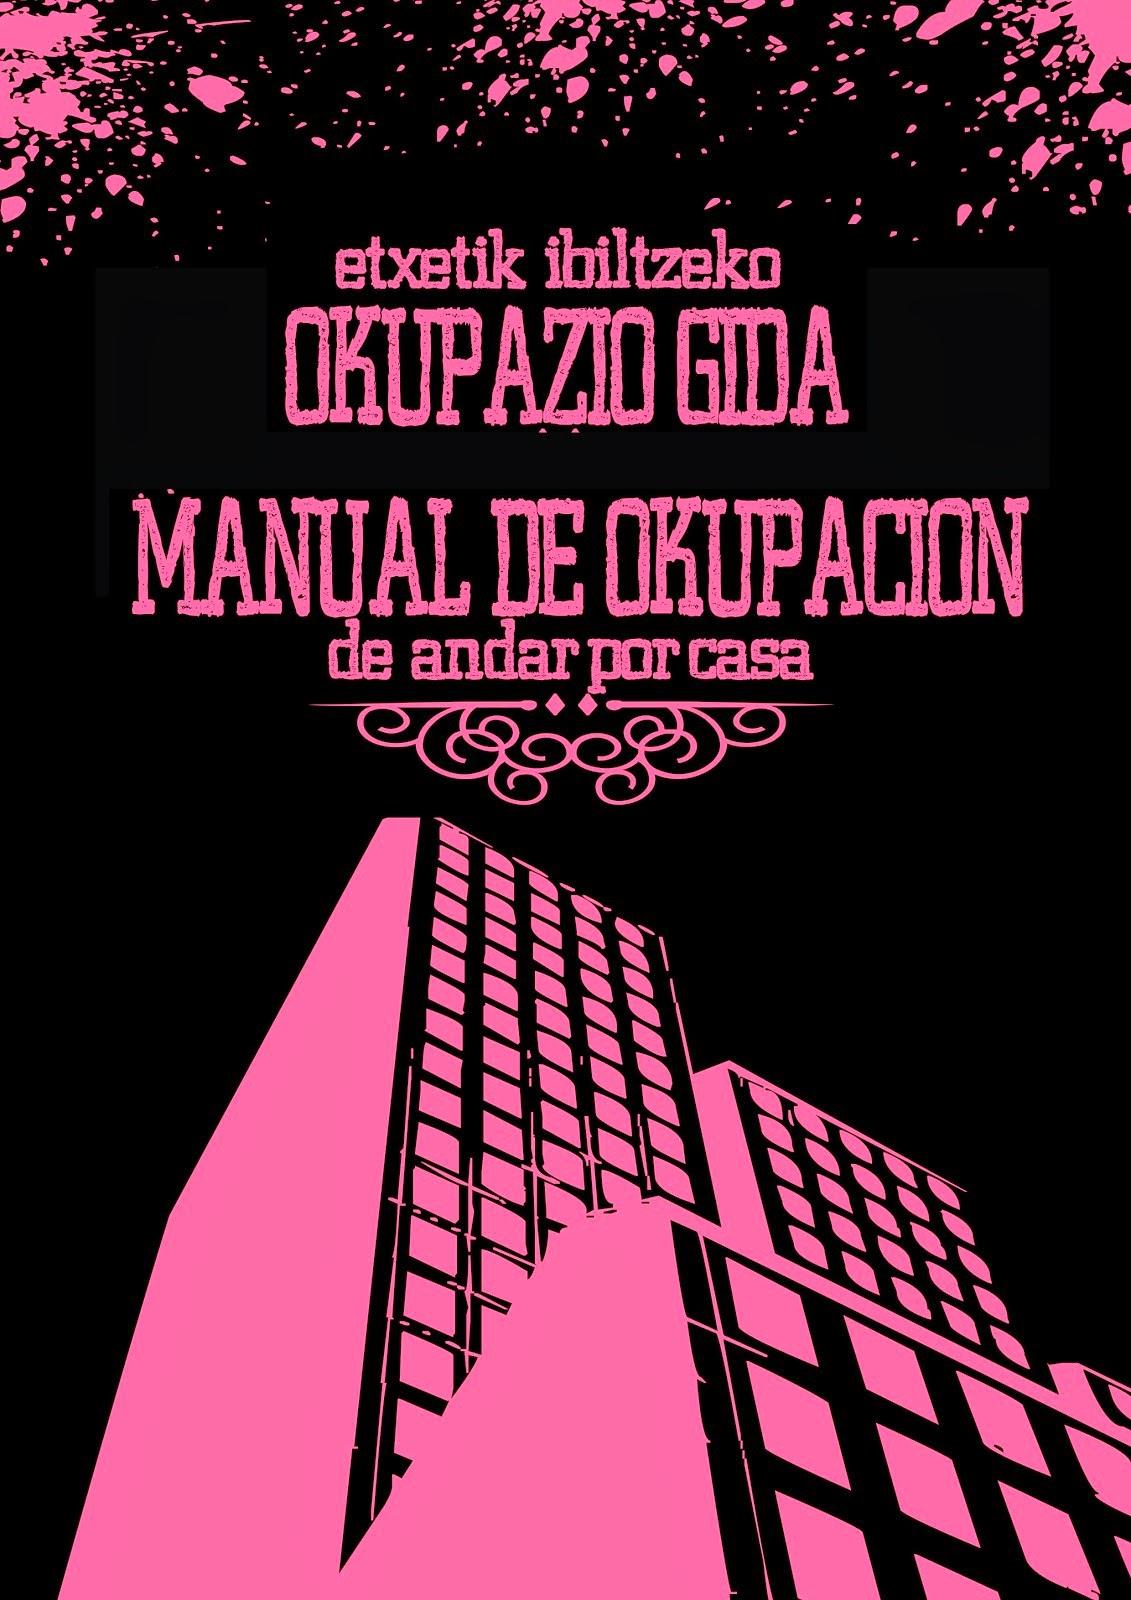 GIDA / MANUAL